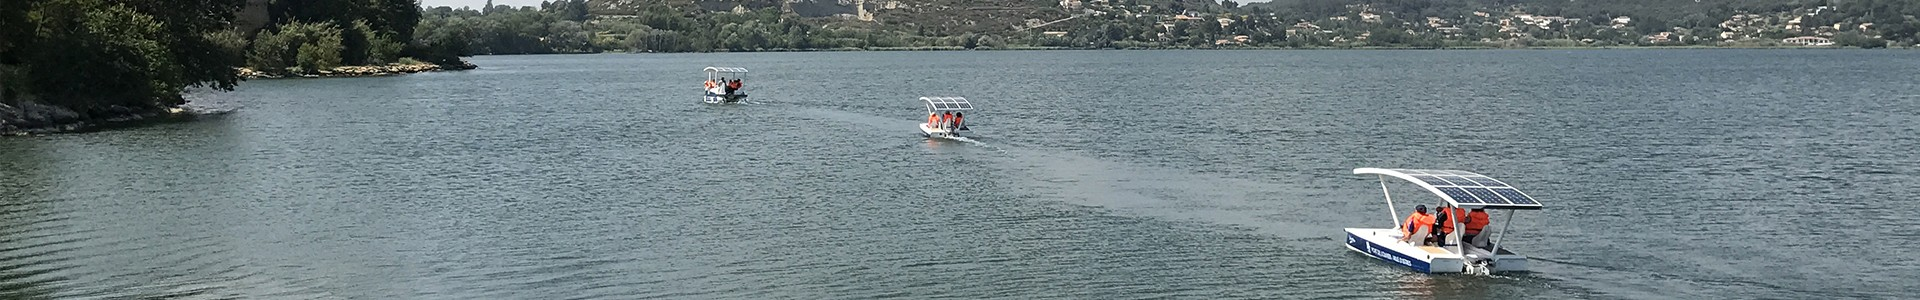 L'étang de l'Olivier & ses activités nautiques